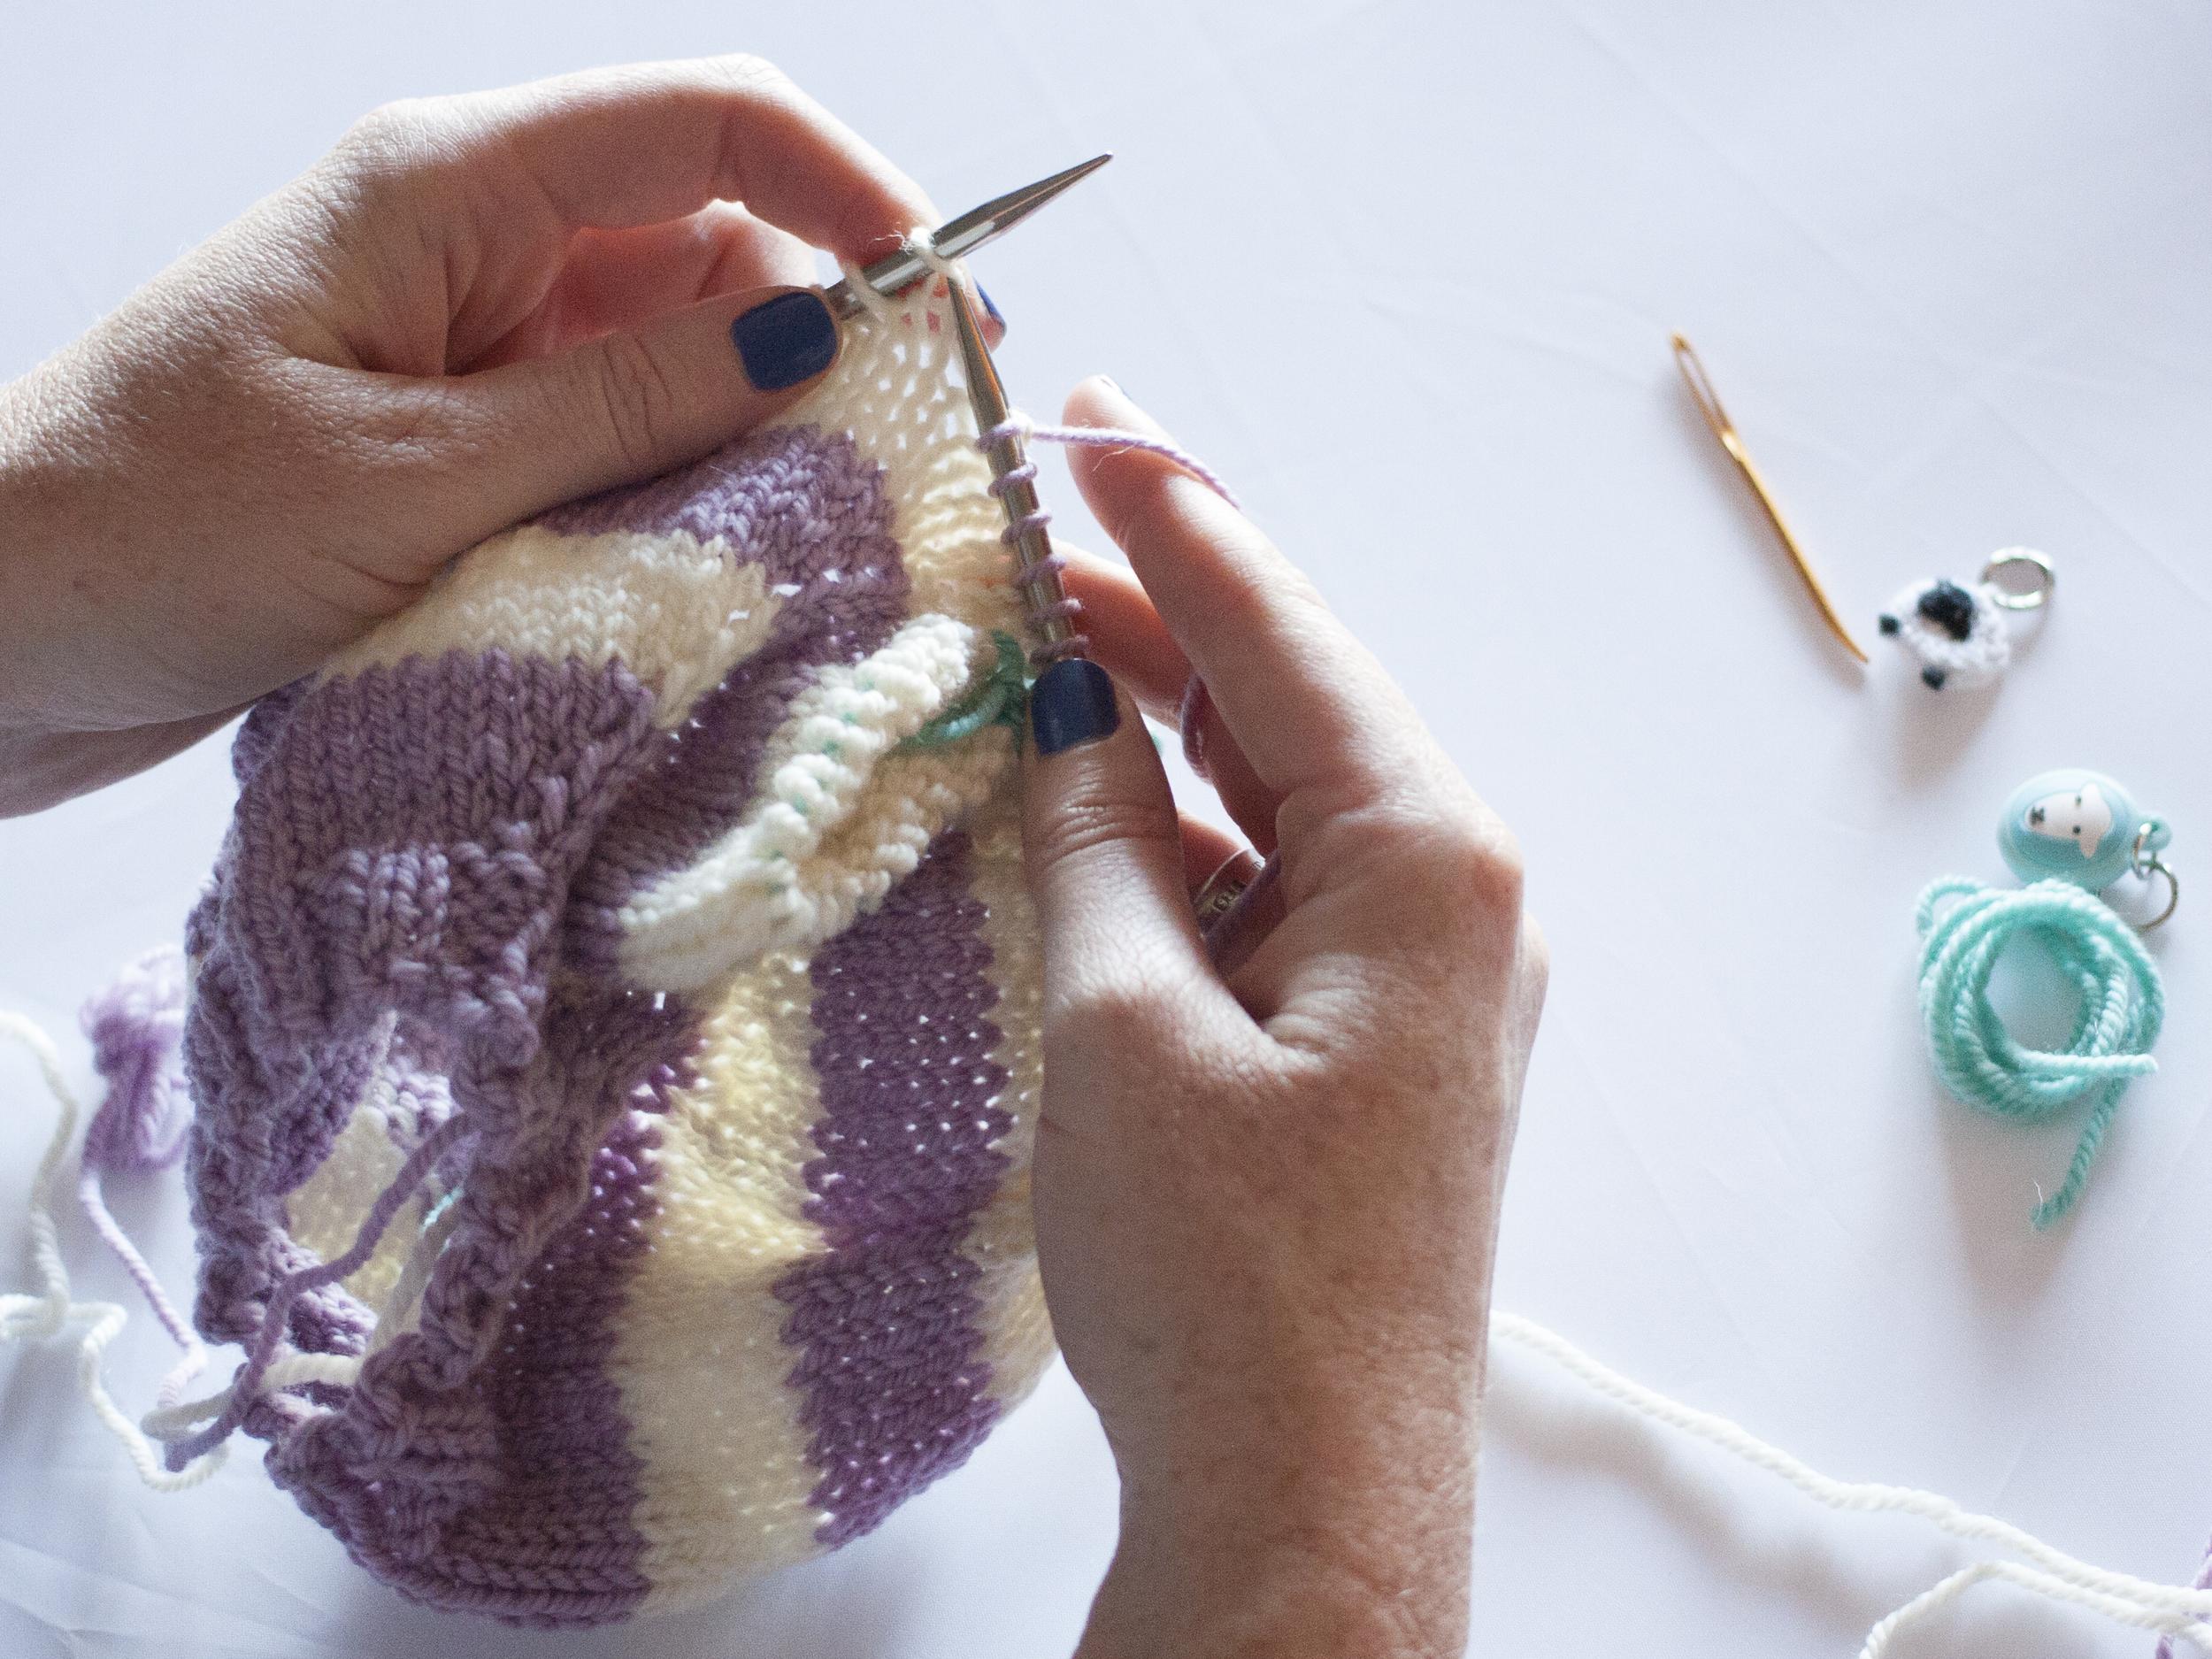 Continue knitting around the row